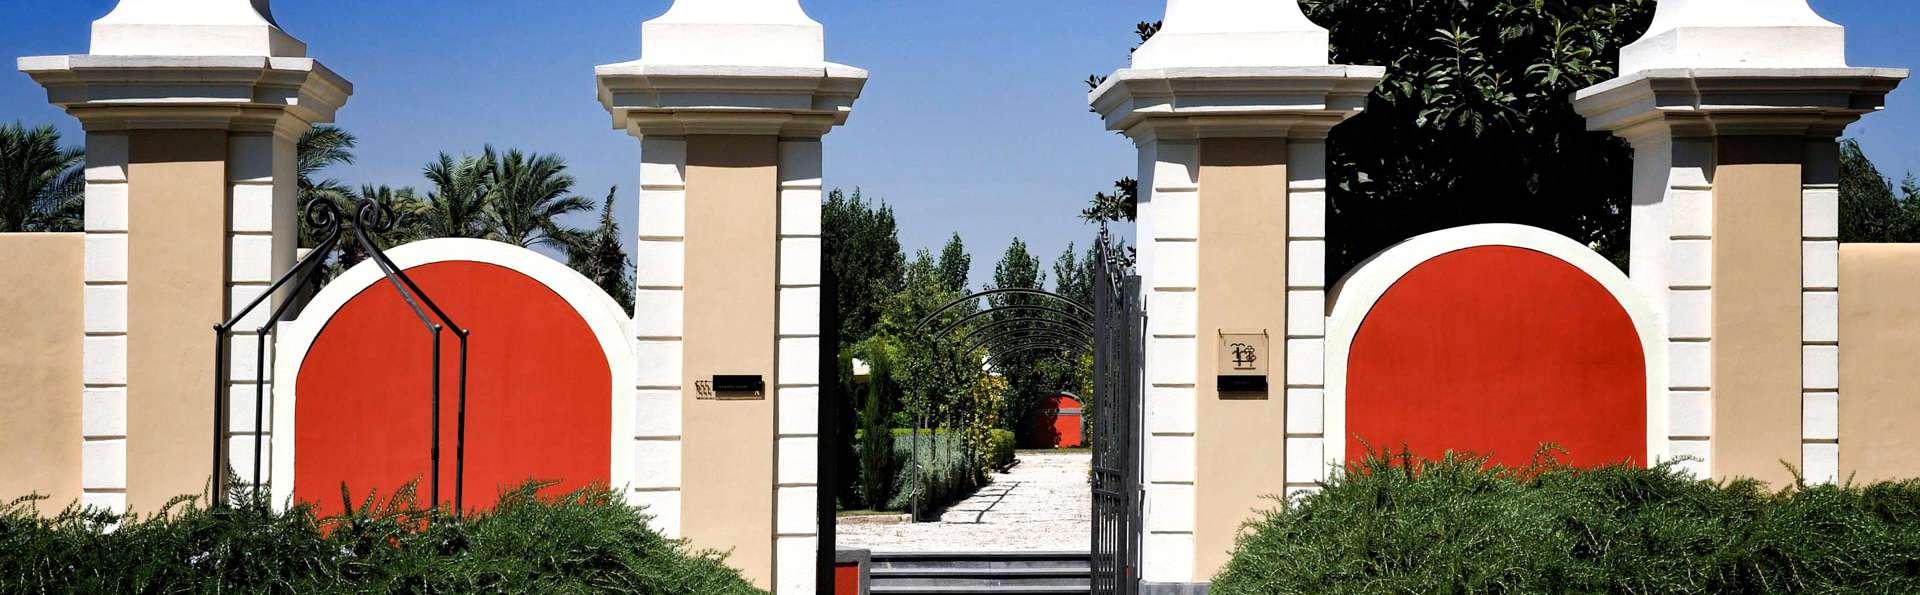 Relais Villa Buonanno - EDIT_FRONT_01.jpg